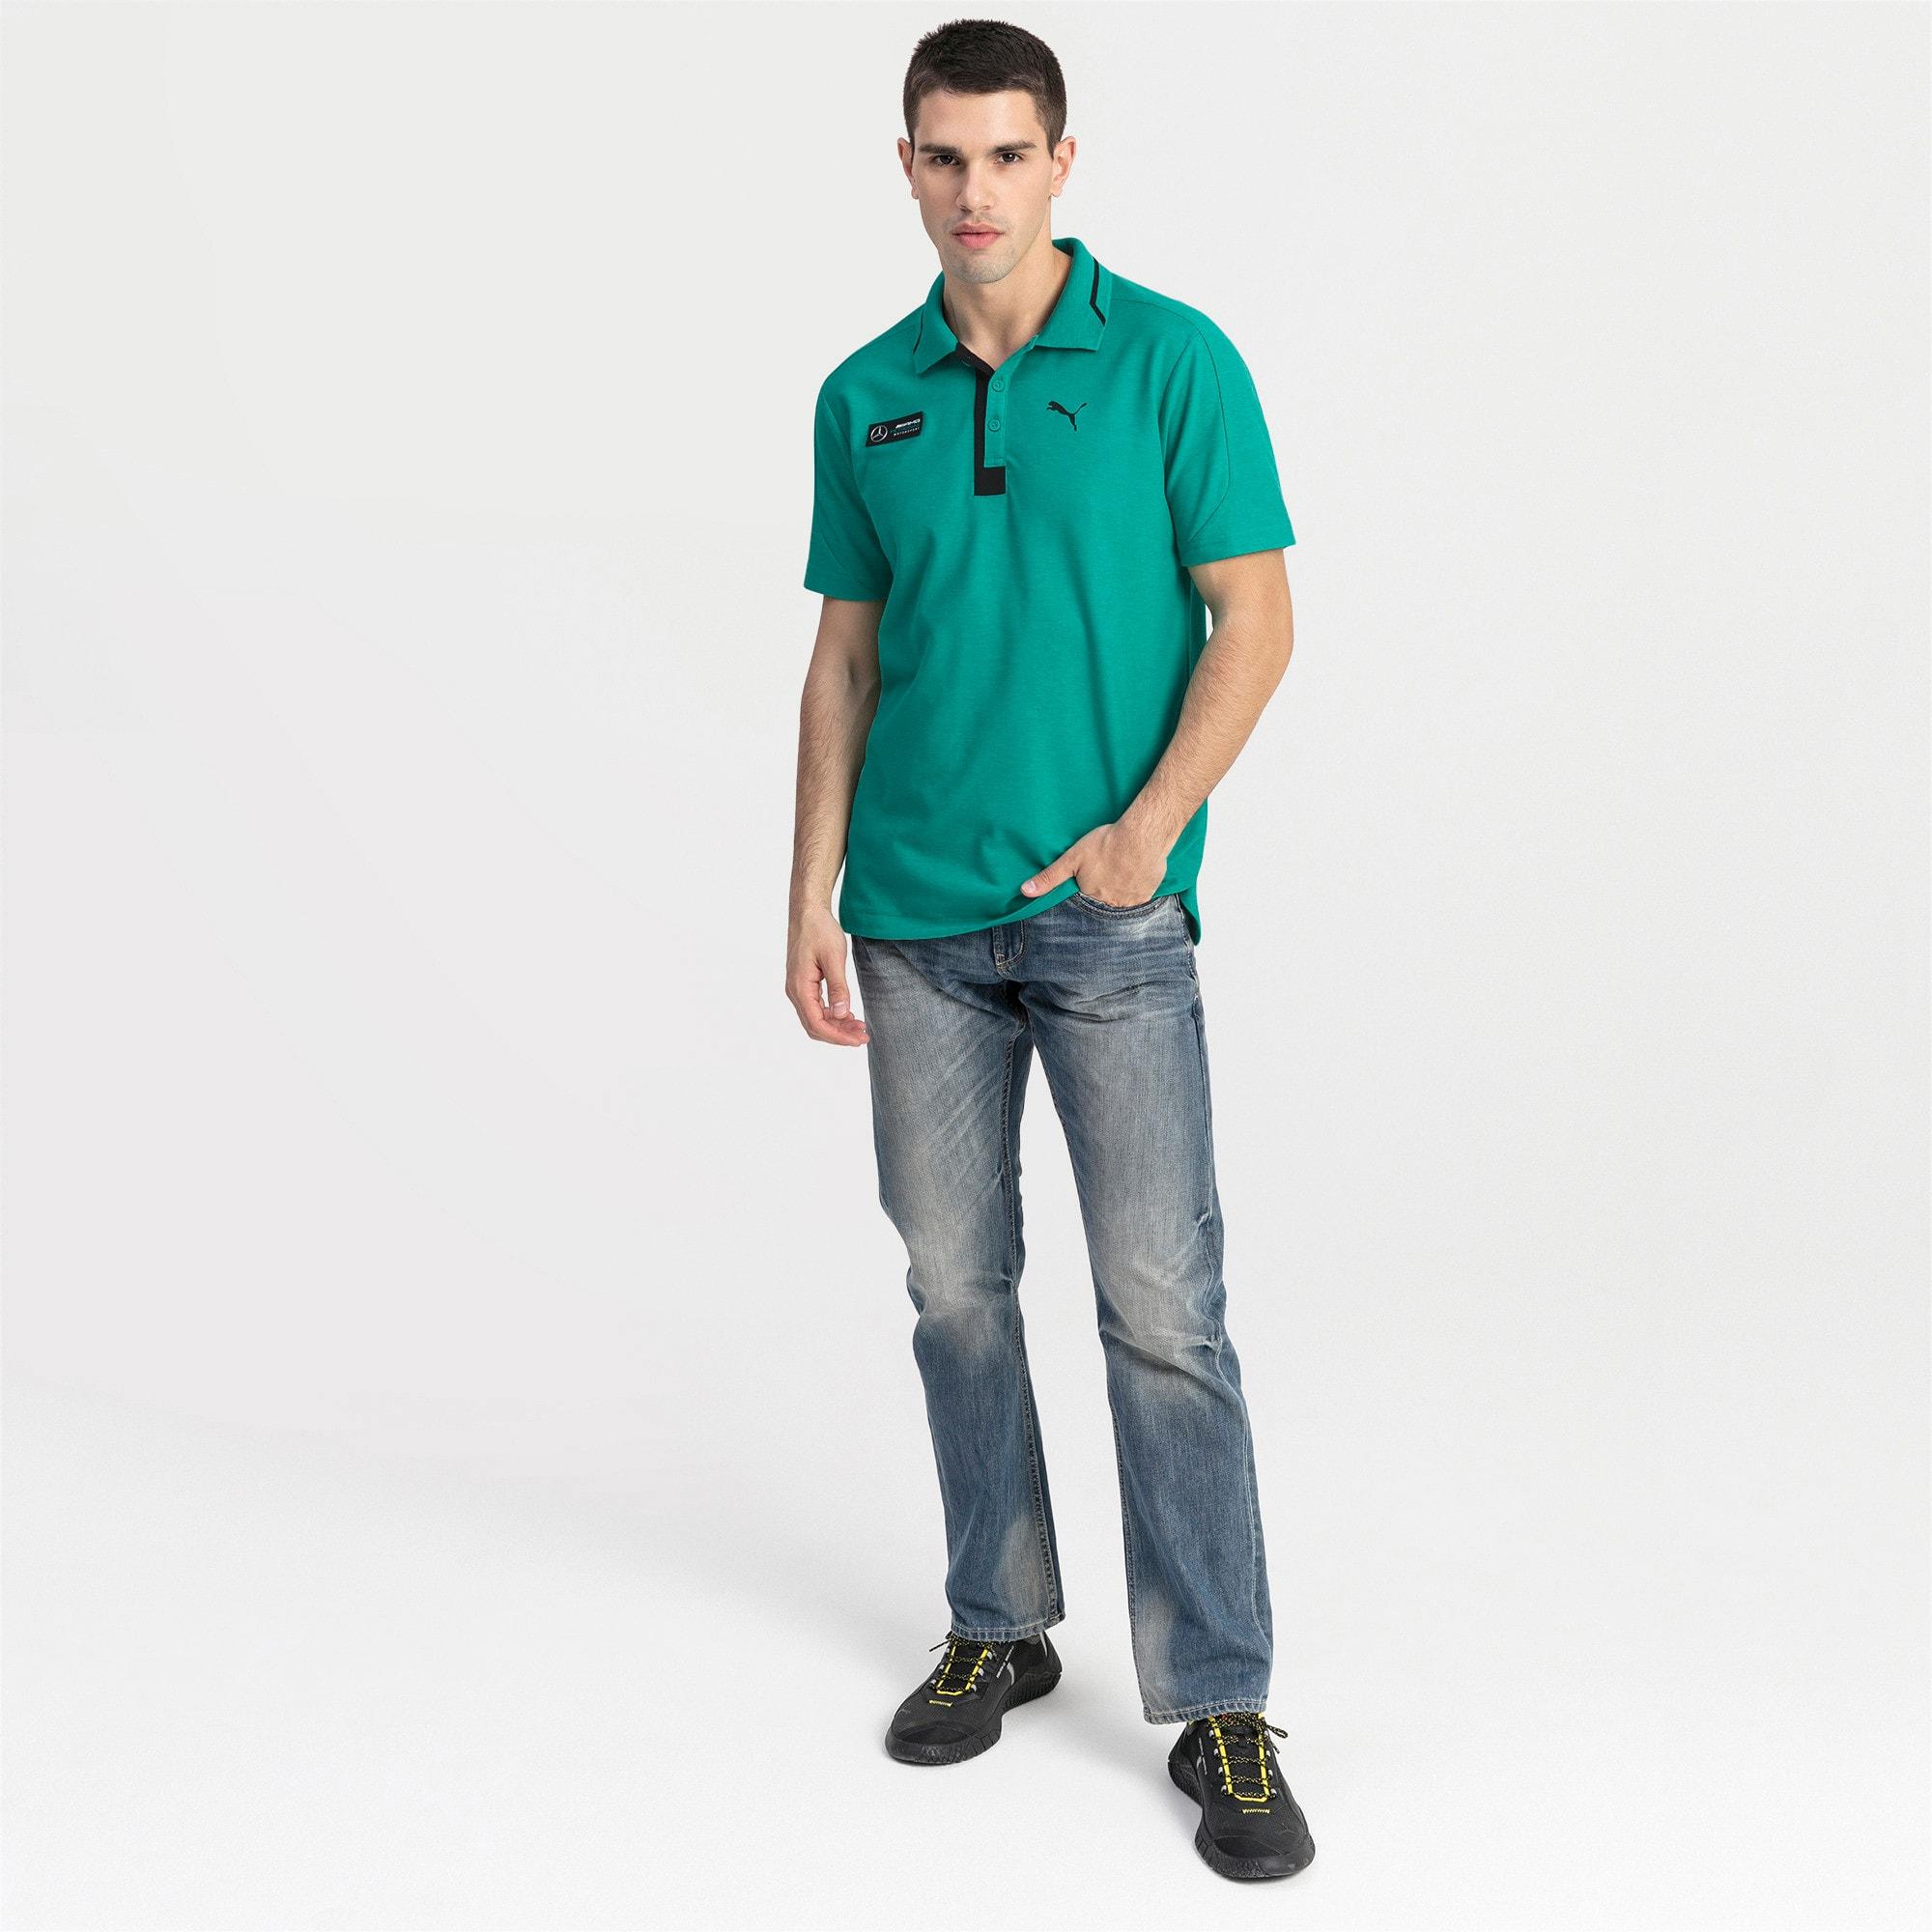 Thumbnail 3 of Mercedes AMG Petronas Men's Polo Shirt, Spectra Green Heather, medium